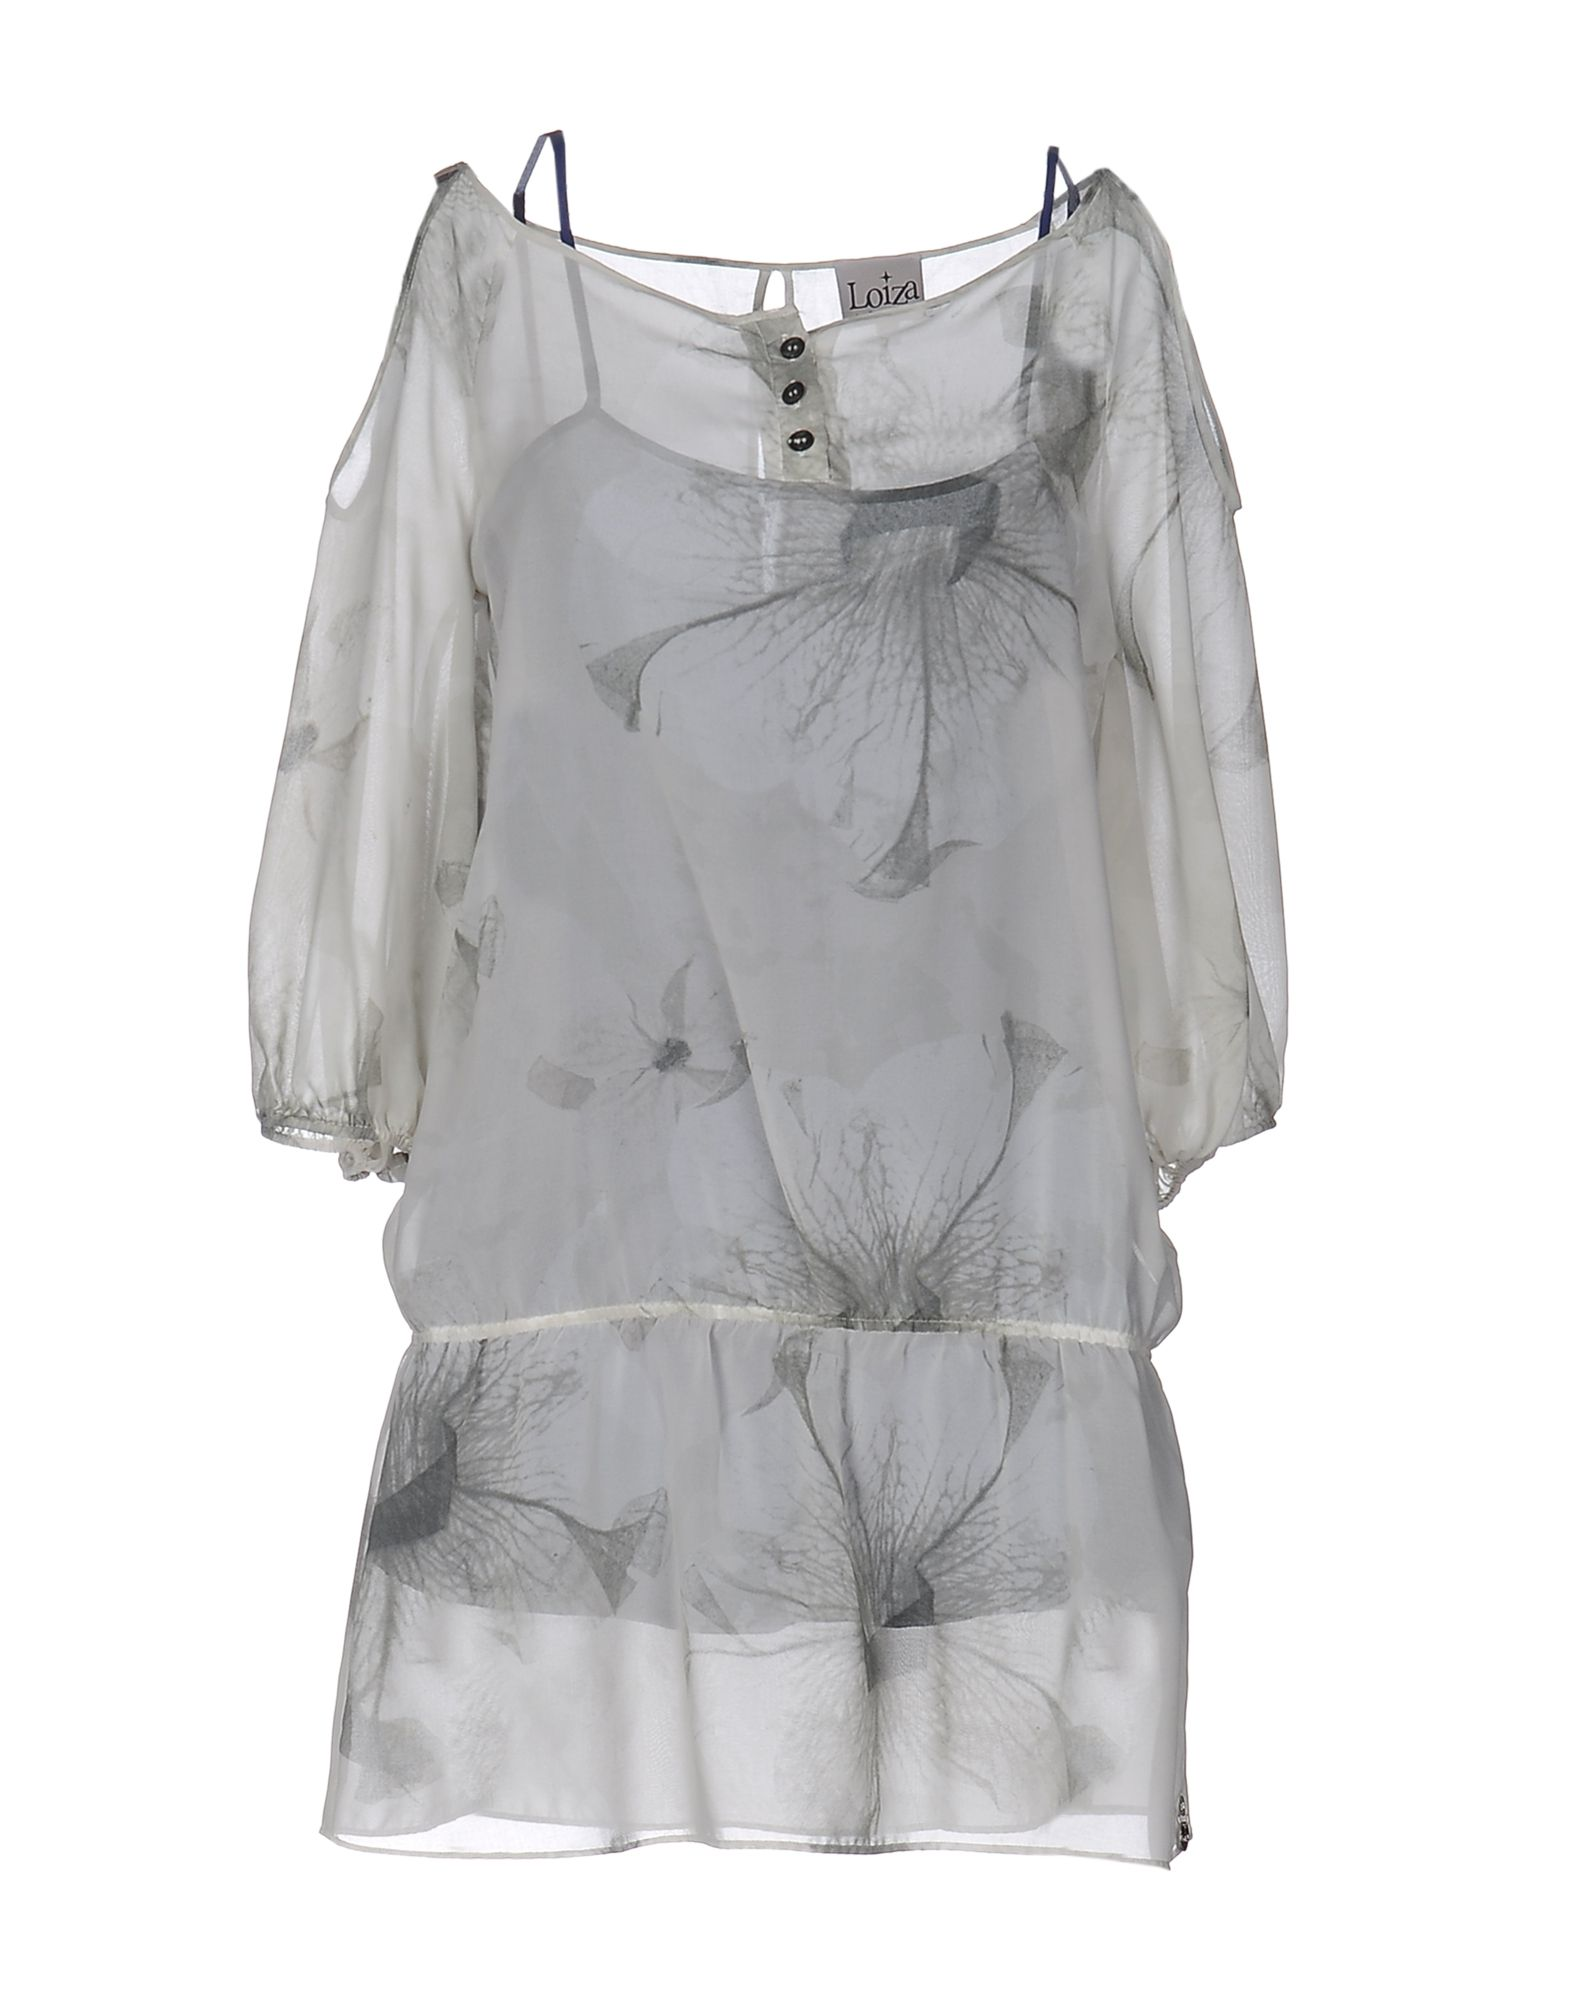 LOIZA by PATRIZIA PEPE Блузка блузка quelle patrizia dini by heine 24656